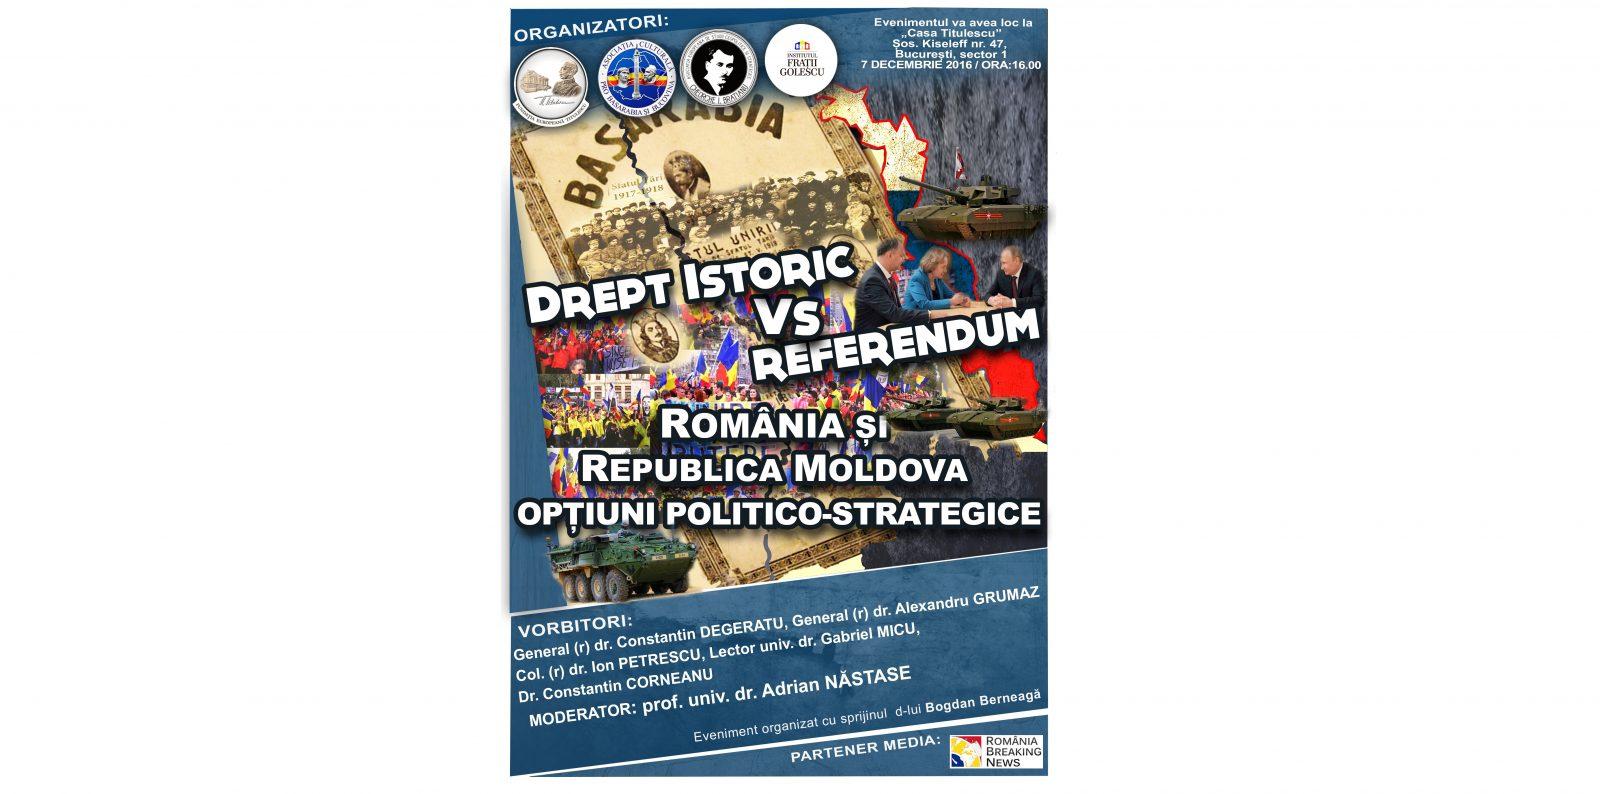 Dezbatere: Drept istoric versus referendum. România și Republica Moldova: opțiuni politico-strategice.